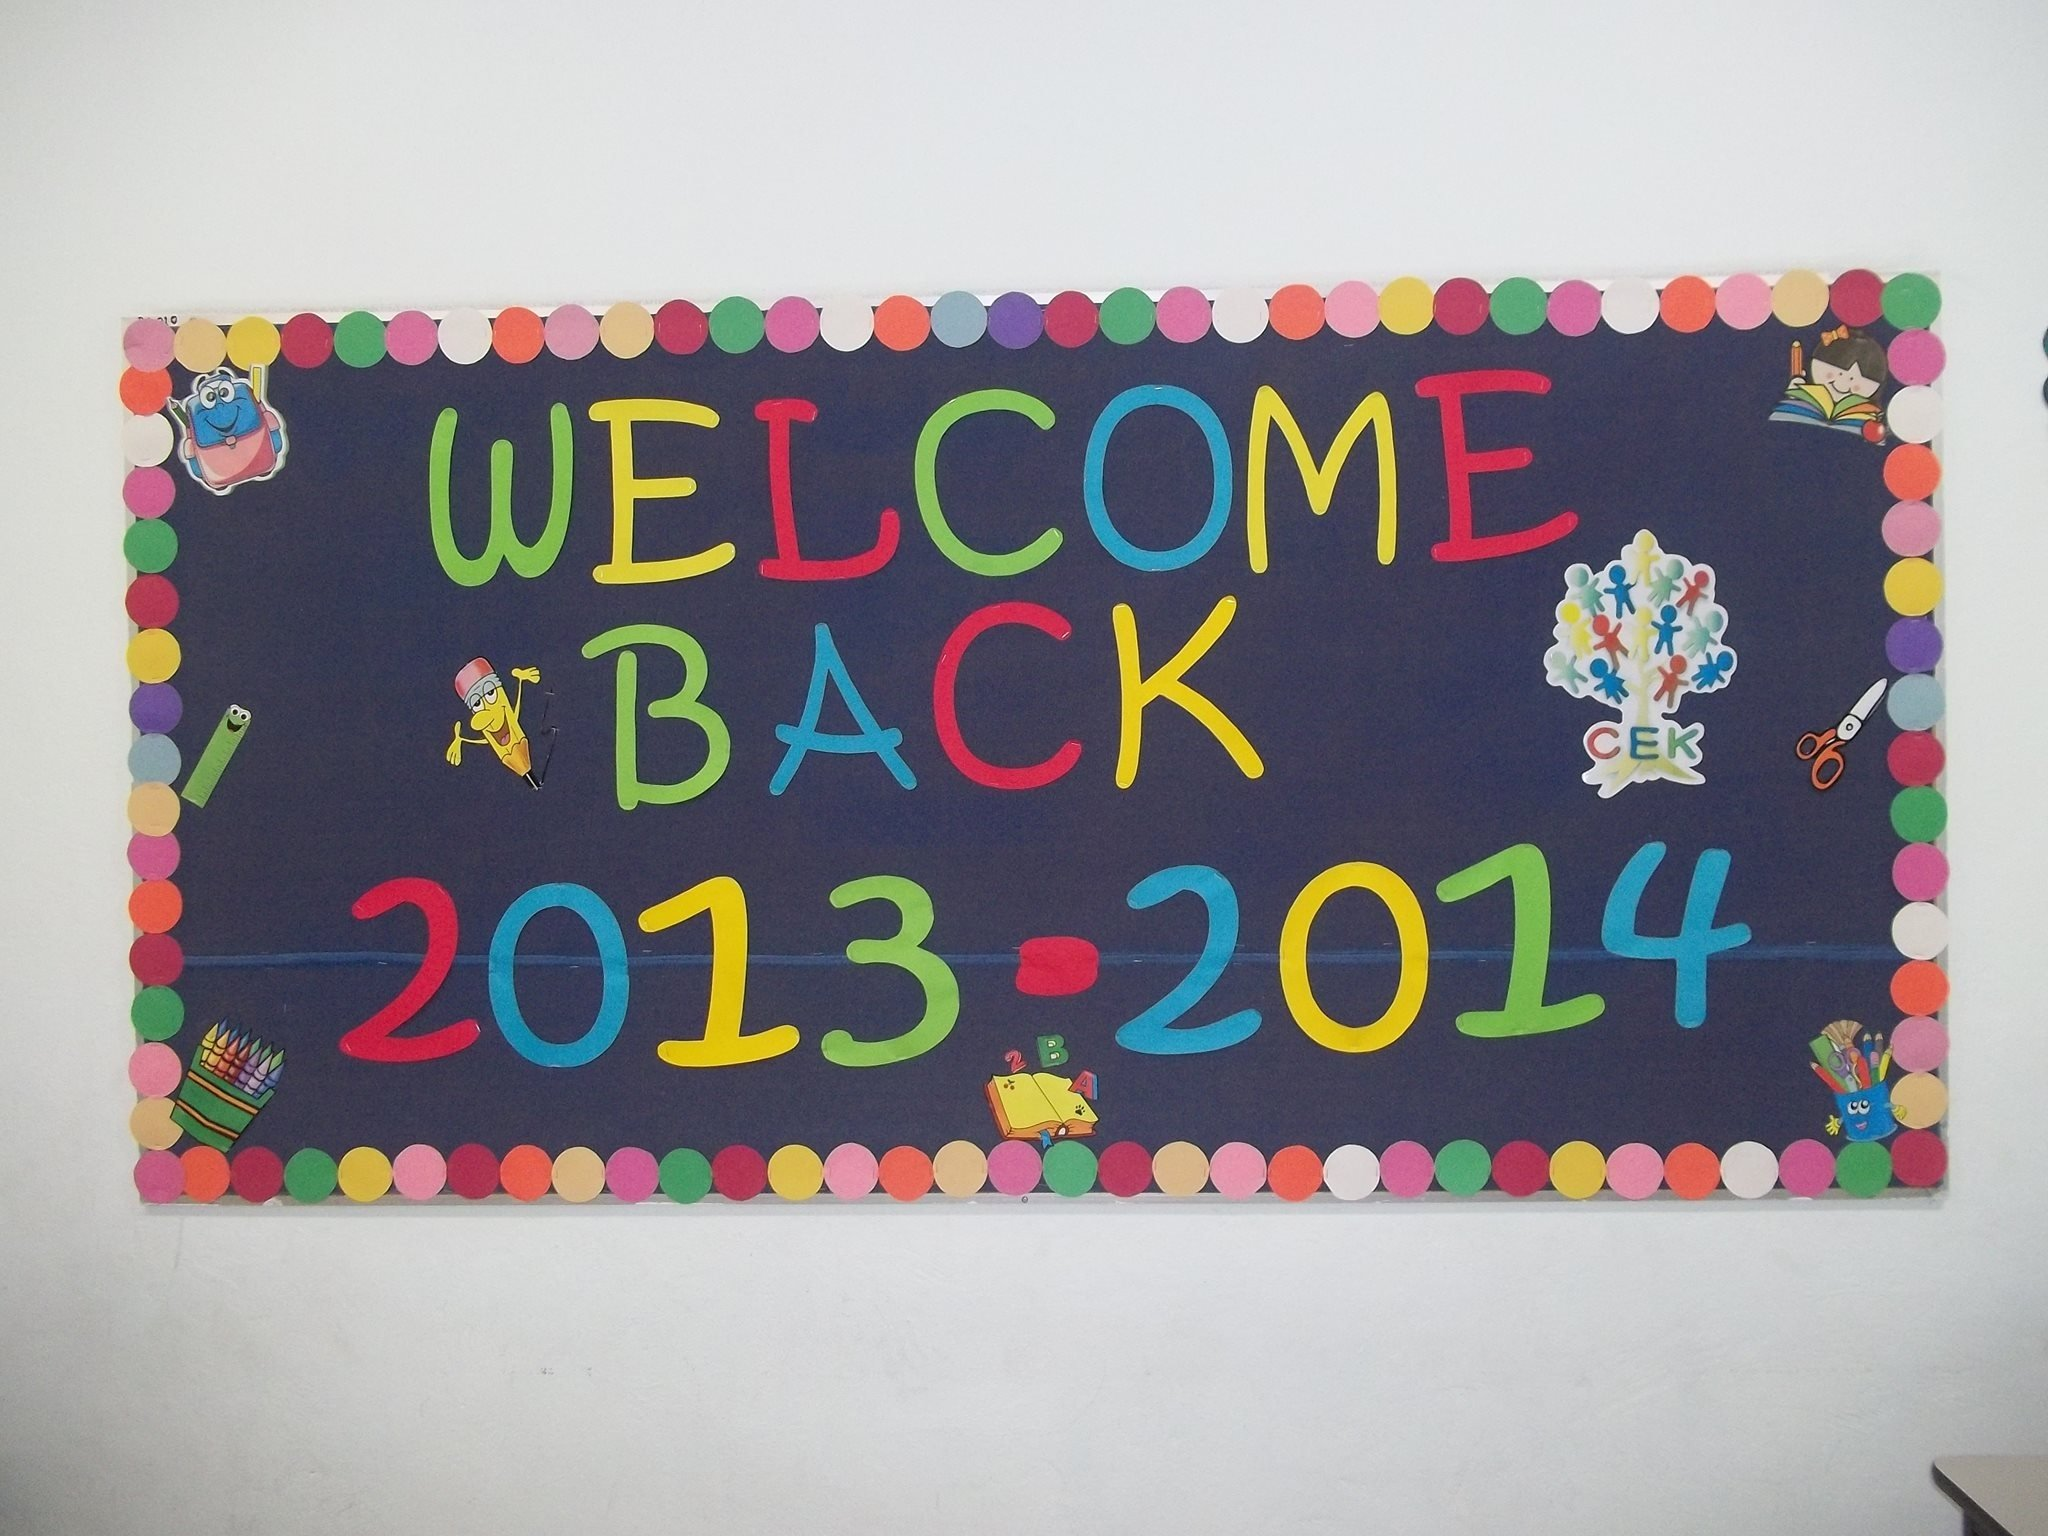 10 Beautiful Back To School Decoration Ideas ides de welcome back to school decorations galerie dimages 2 2020